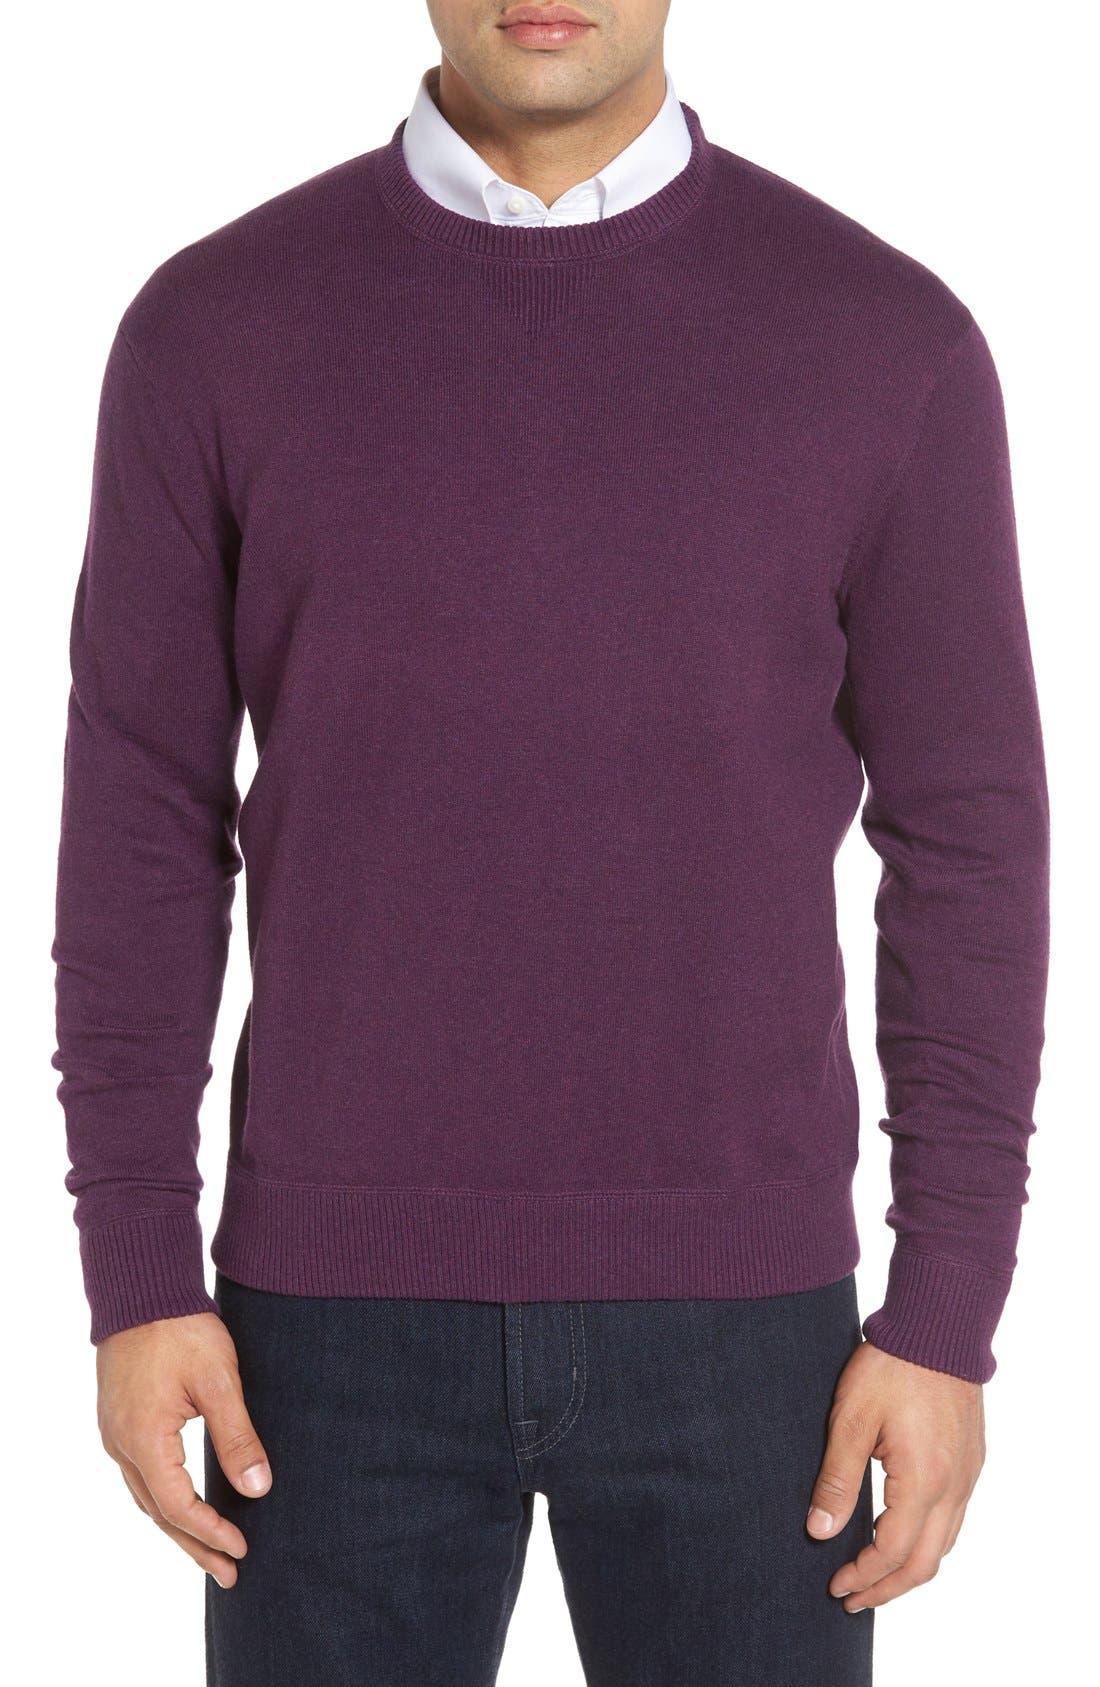 'Jersey Sport' Cotton Blend Crewneck Sweater,                             Main thumbnail 6, color,